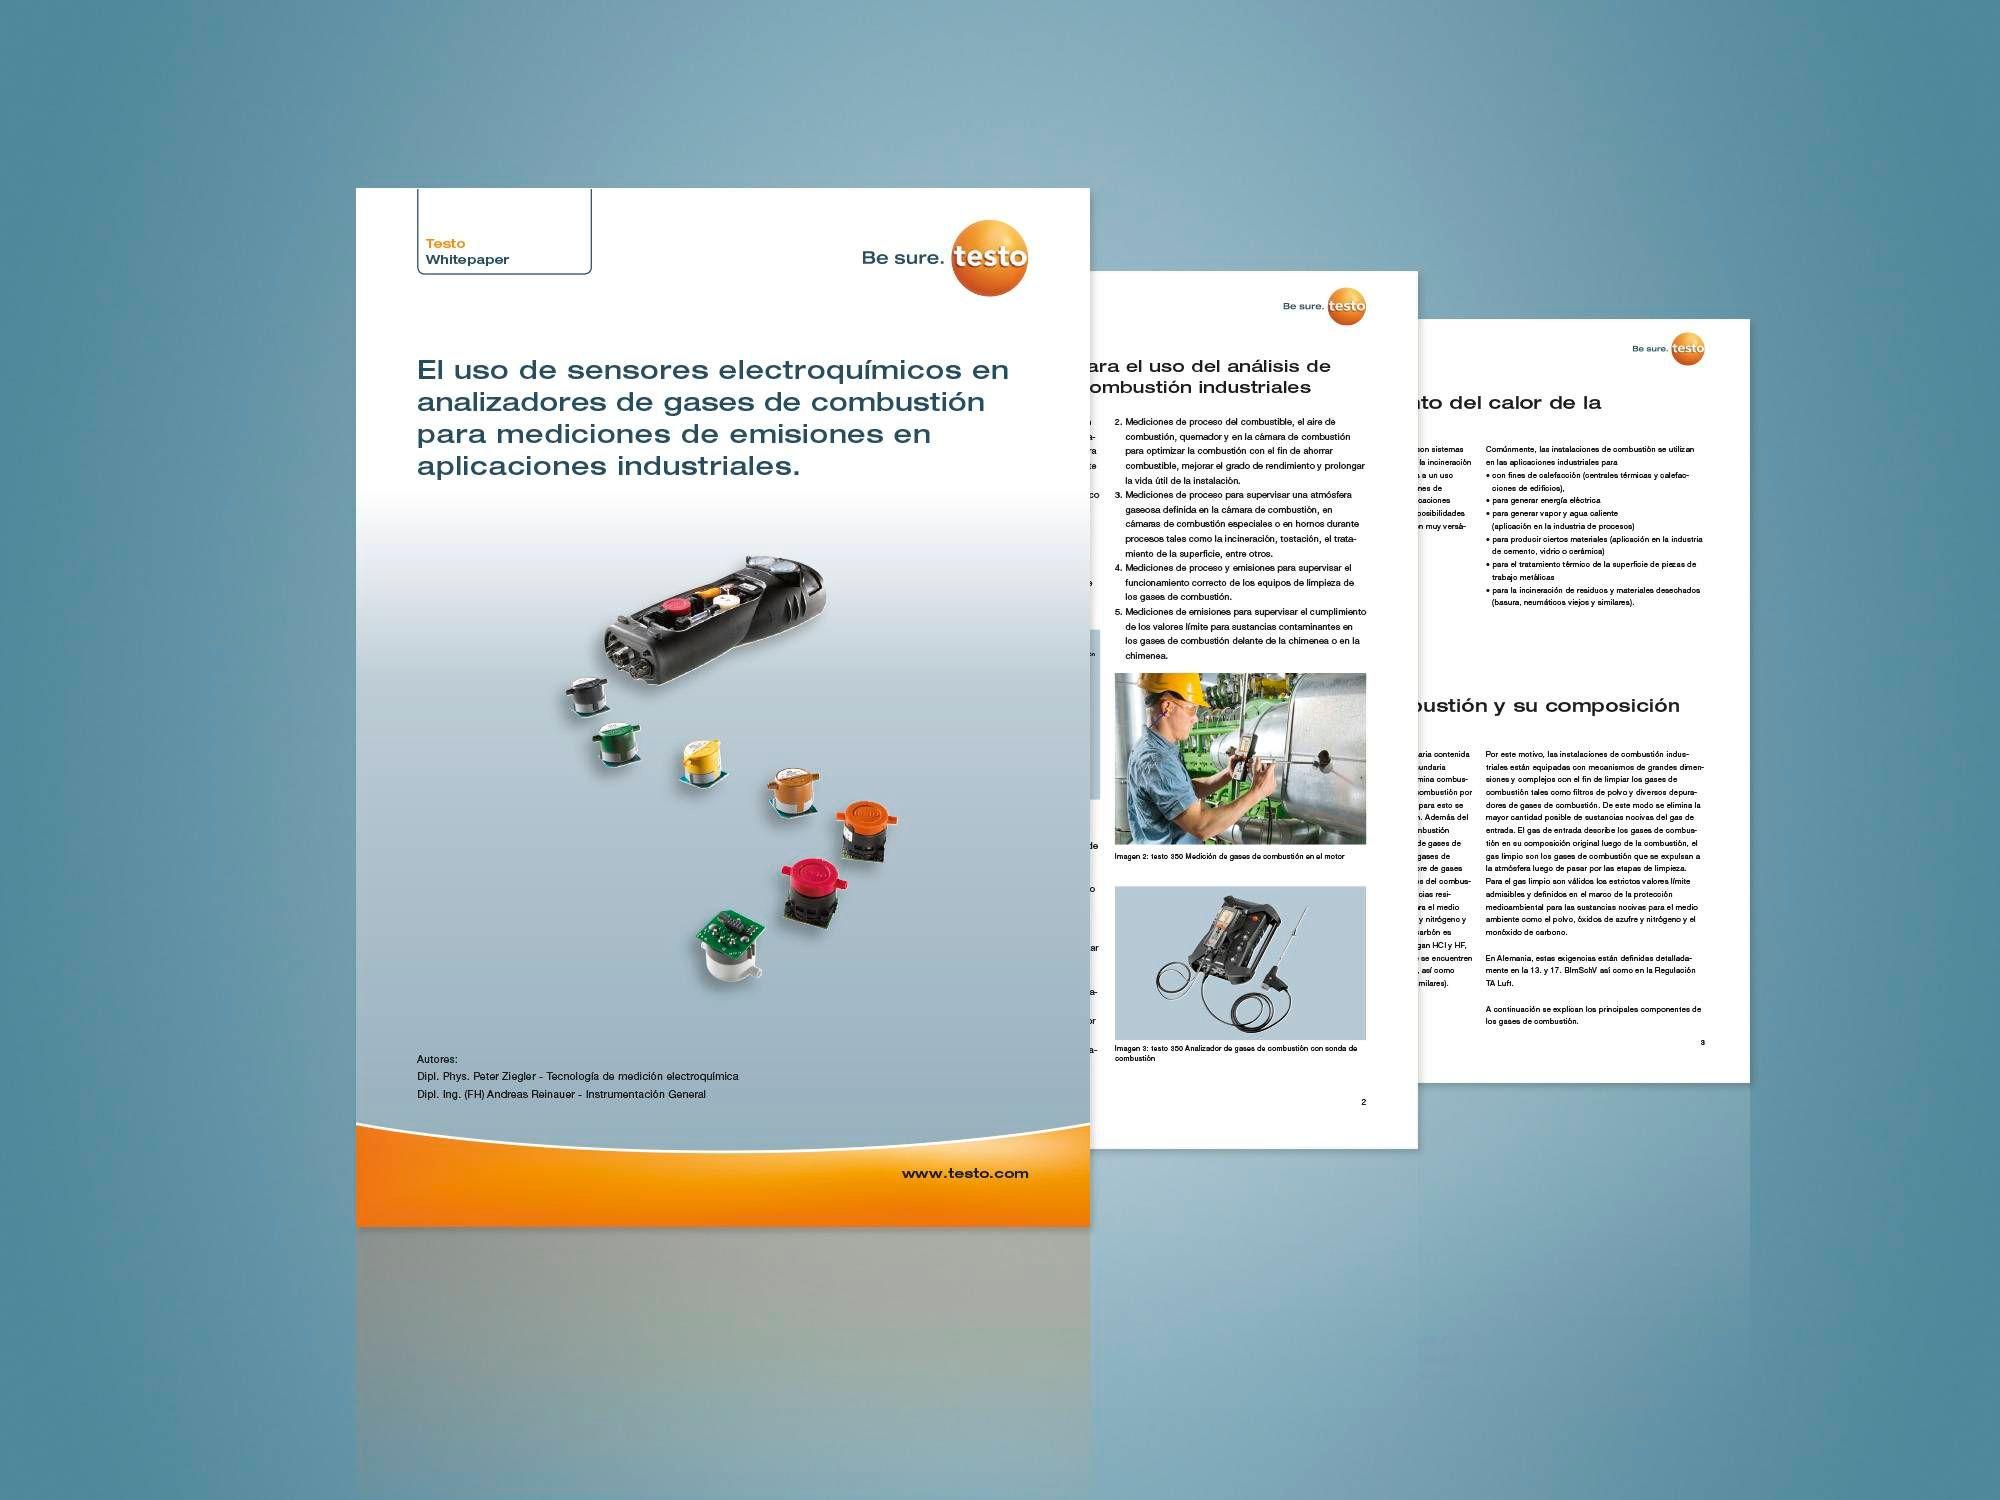 Whitepaper sensores electroquímicos Testo